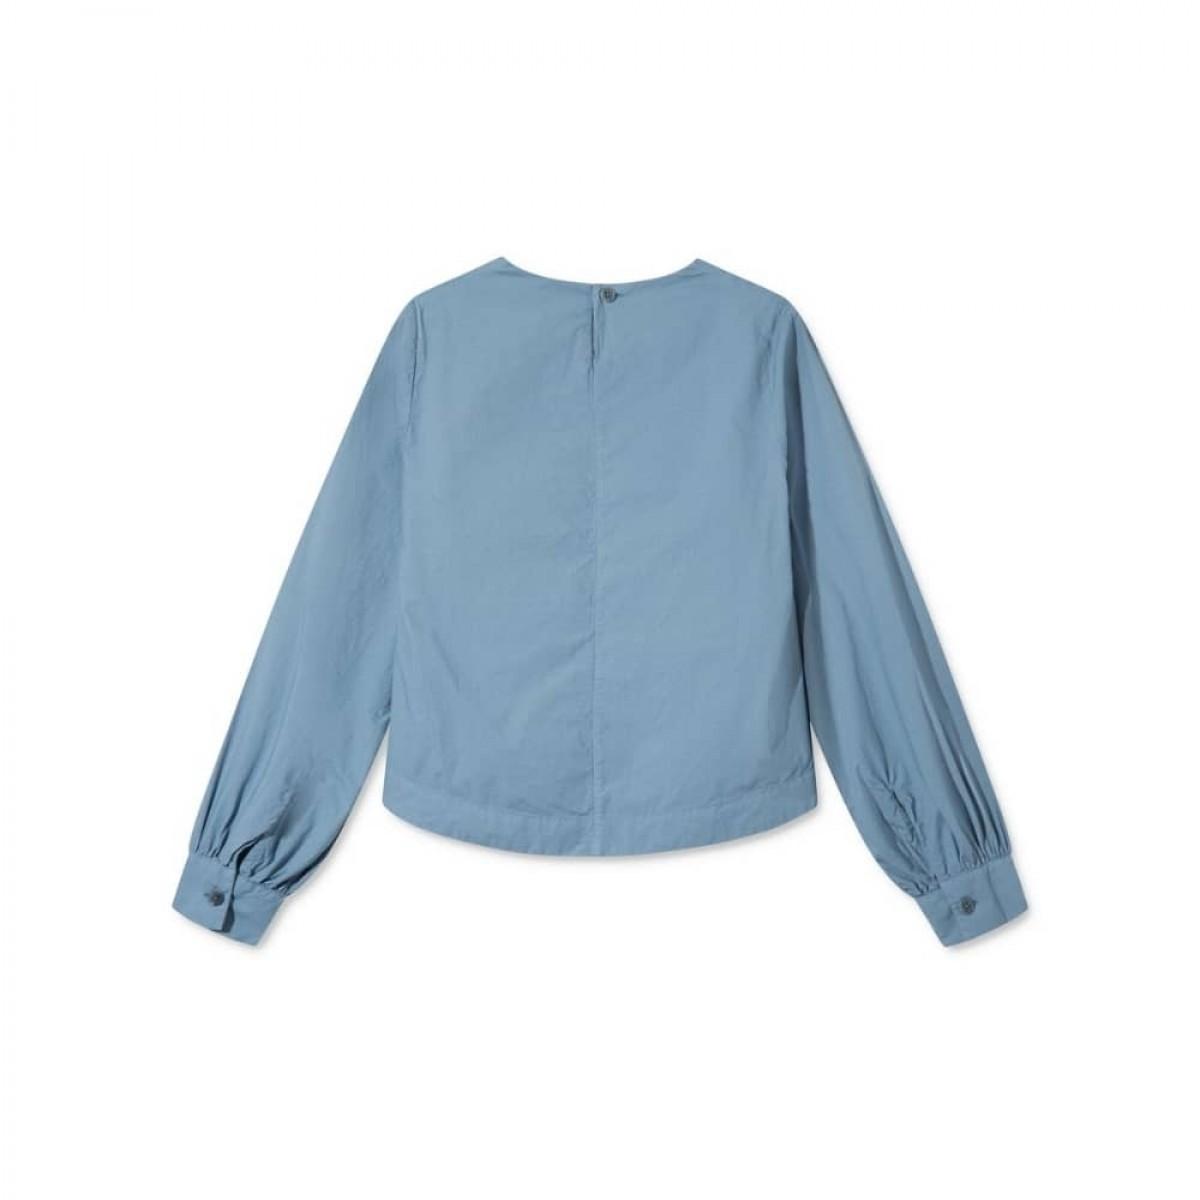 sada skjorte bluse - blue - ryggen